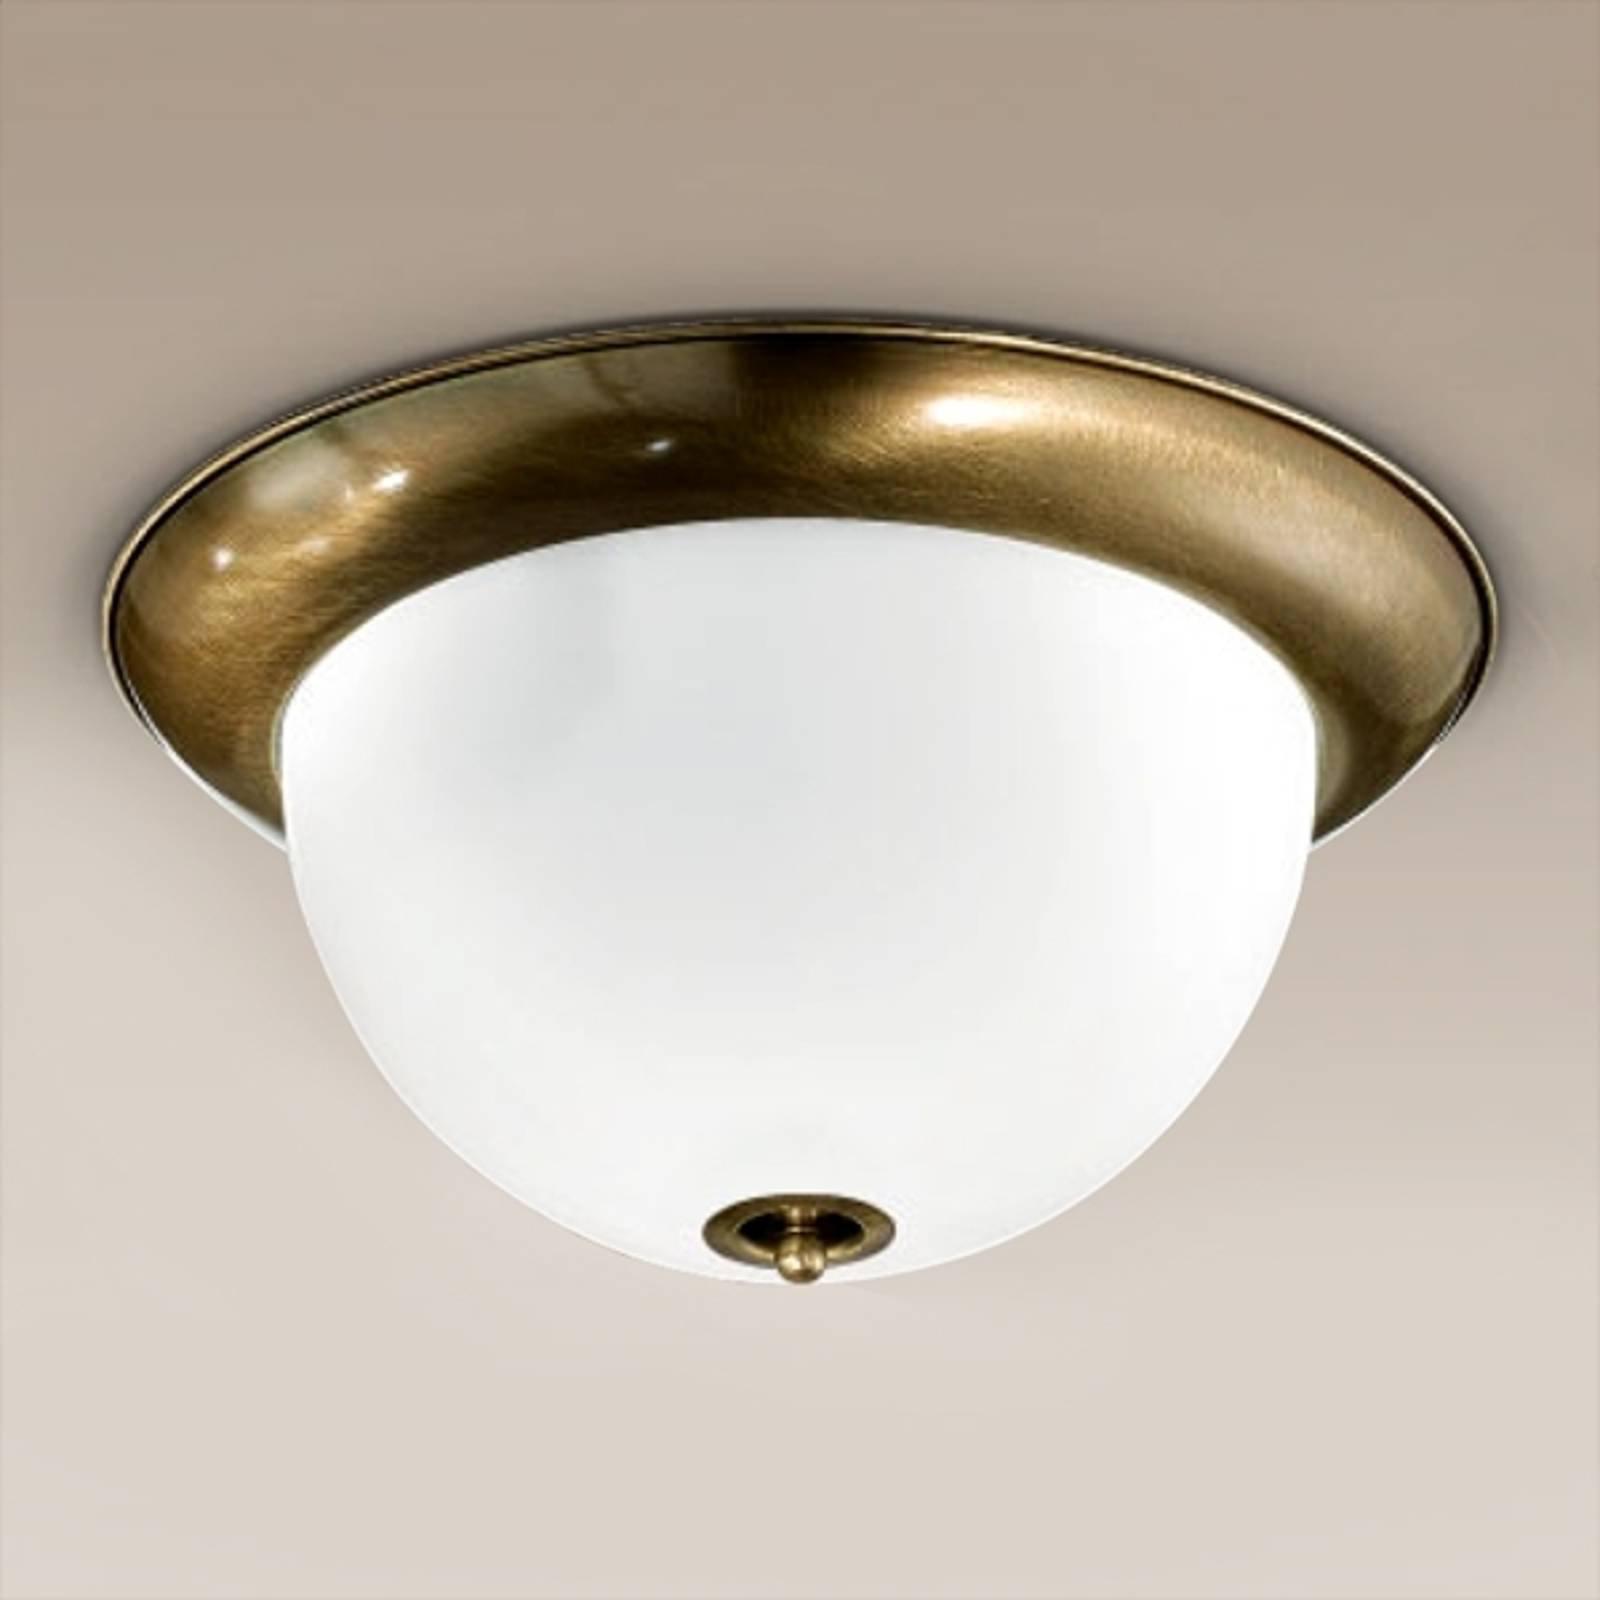 Klassisk Galleria taklampe